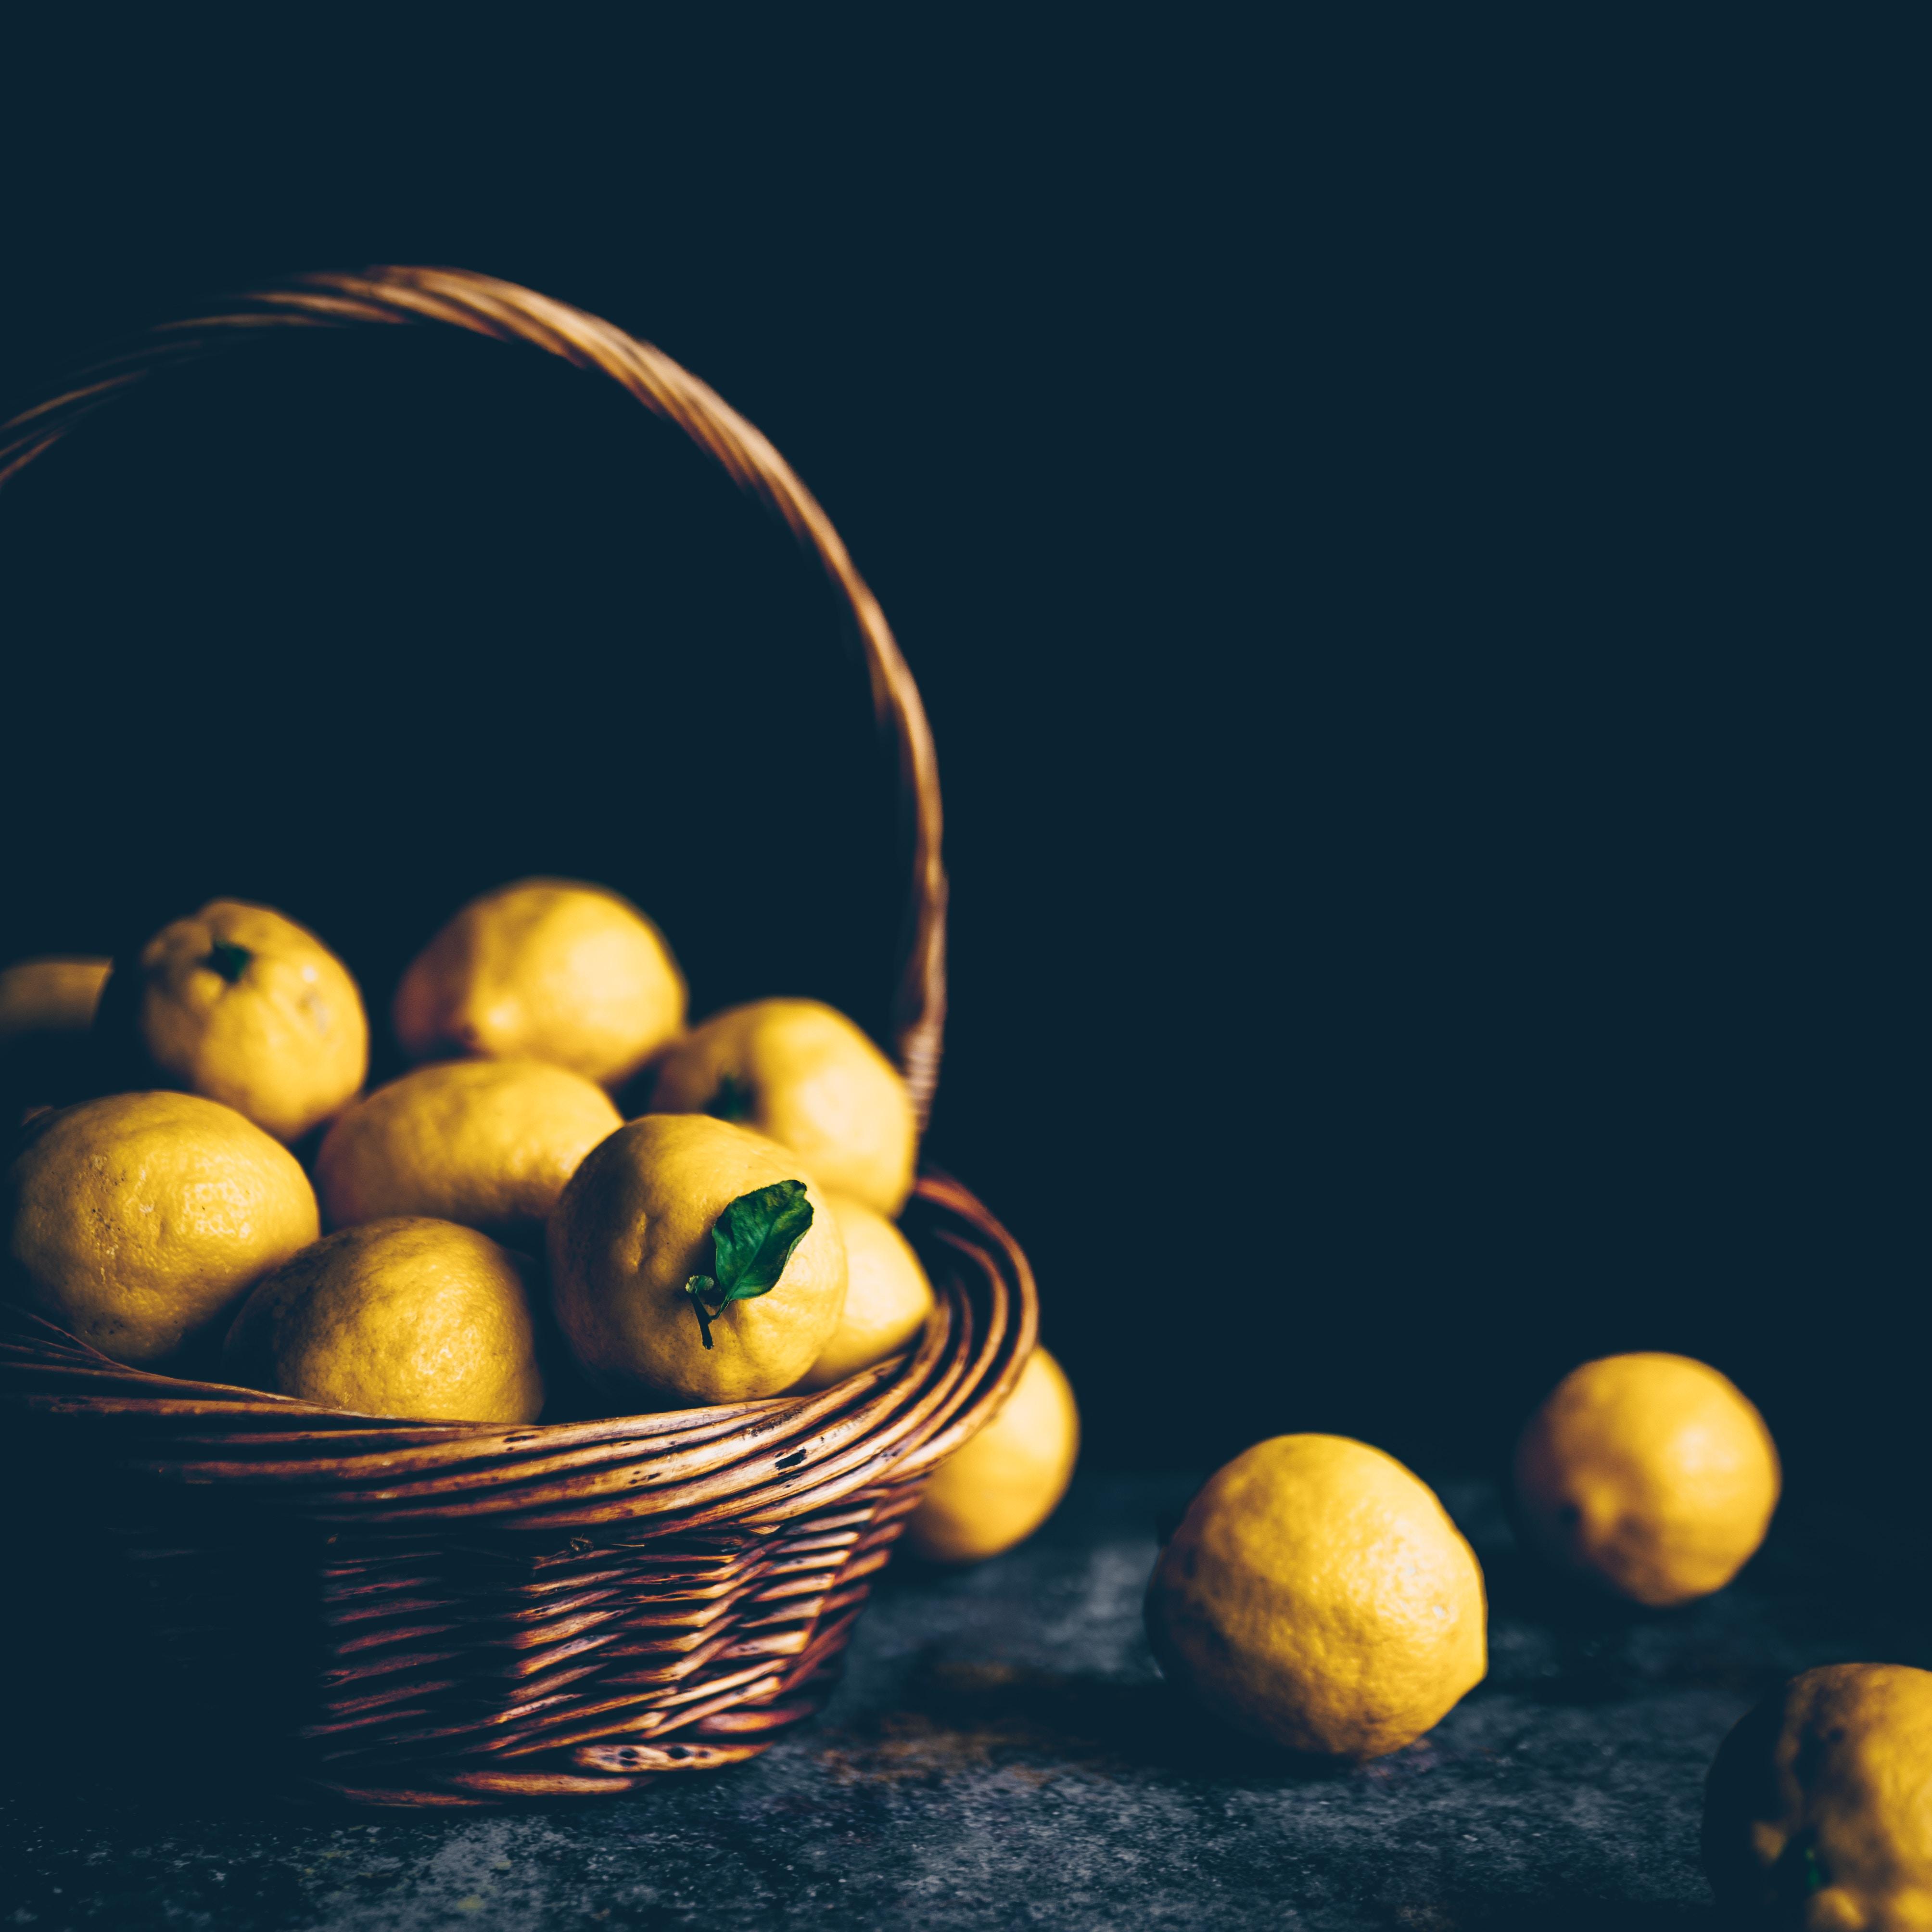 154569 download wallpaper Food, Lemons, Fruit, Citrus, Basket, Sour screensavers and pictures for free